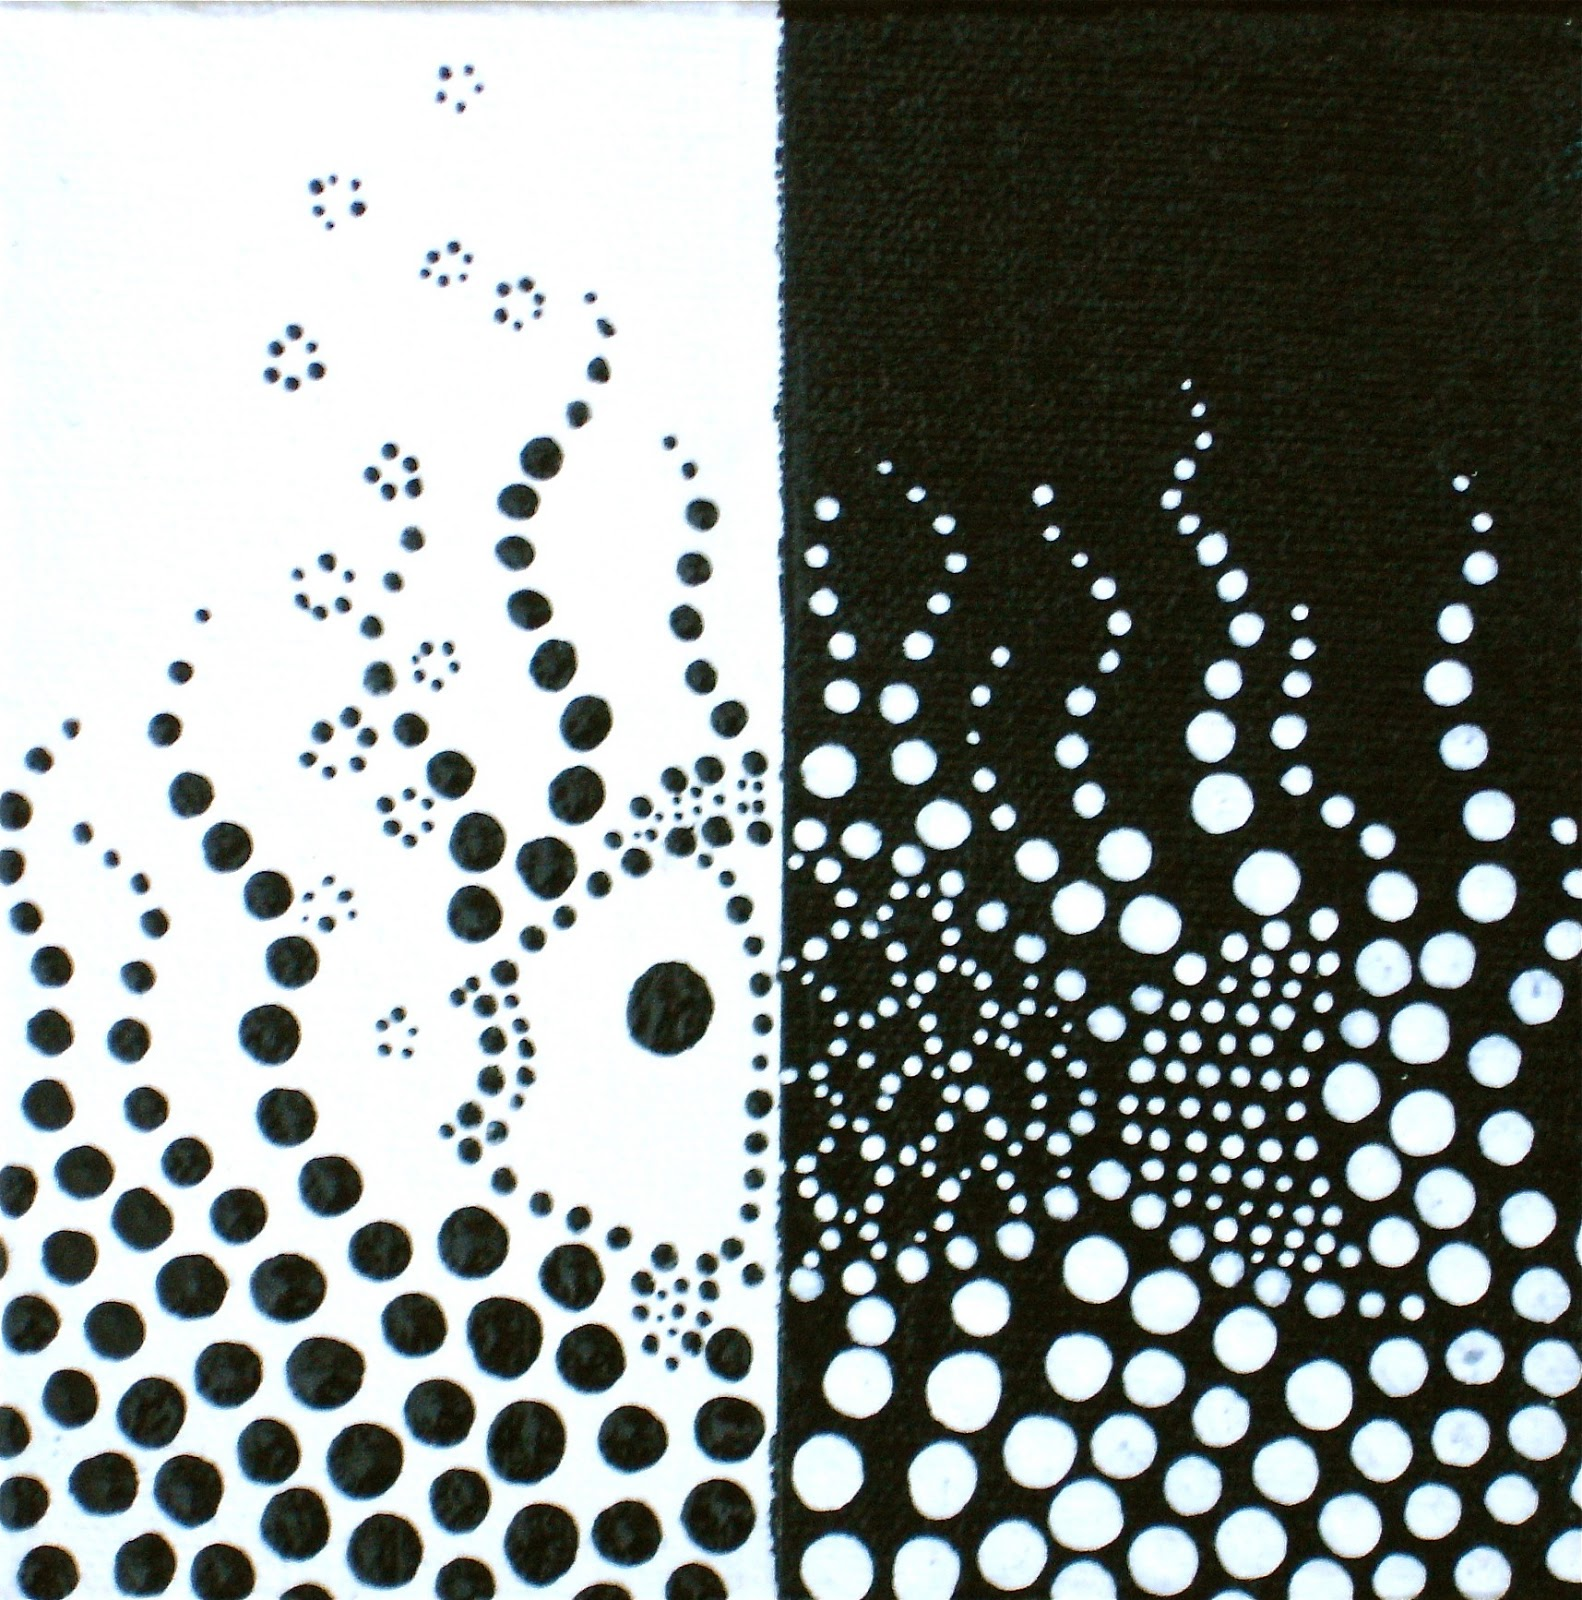 Dot Art April